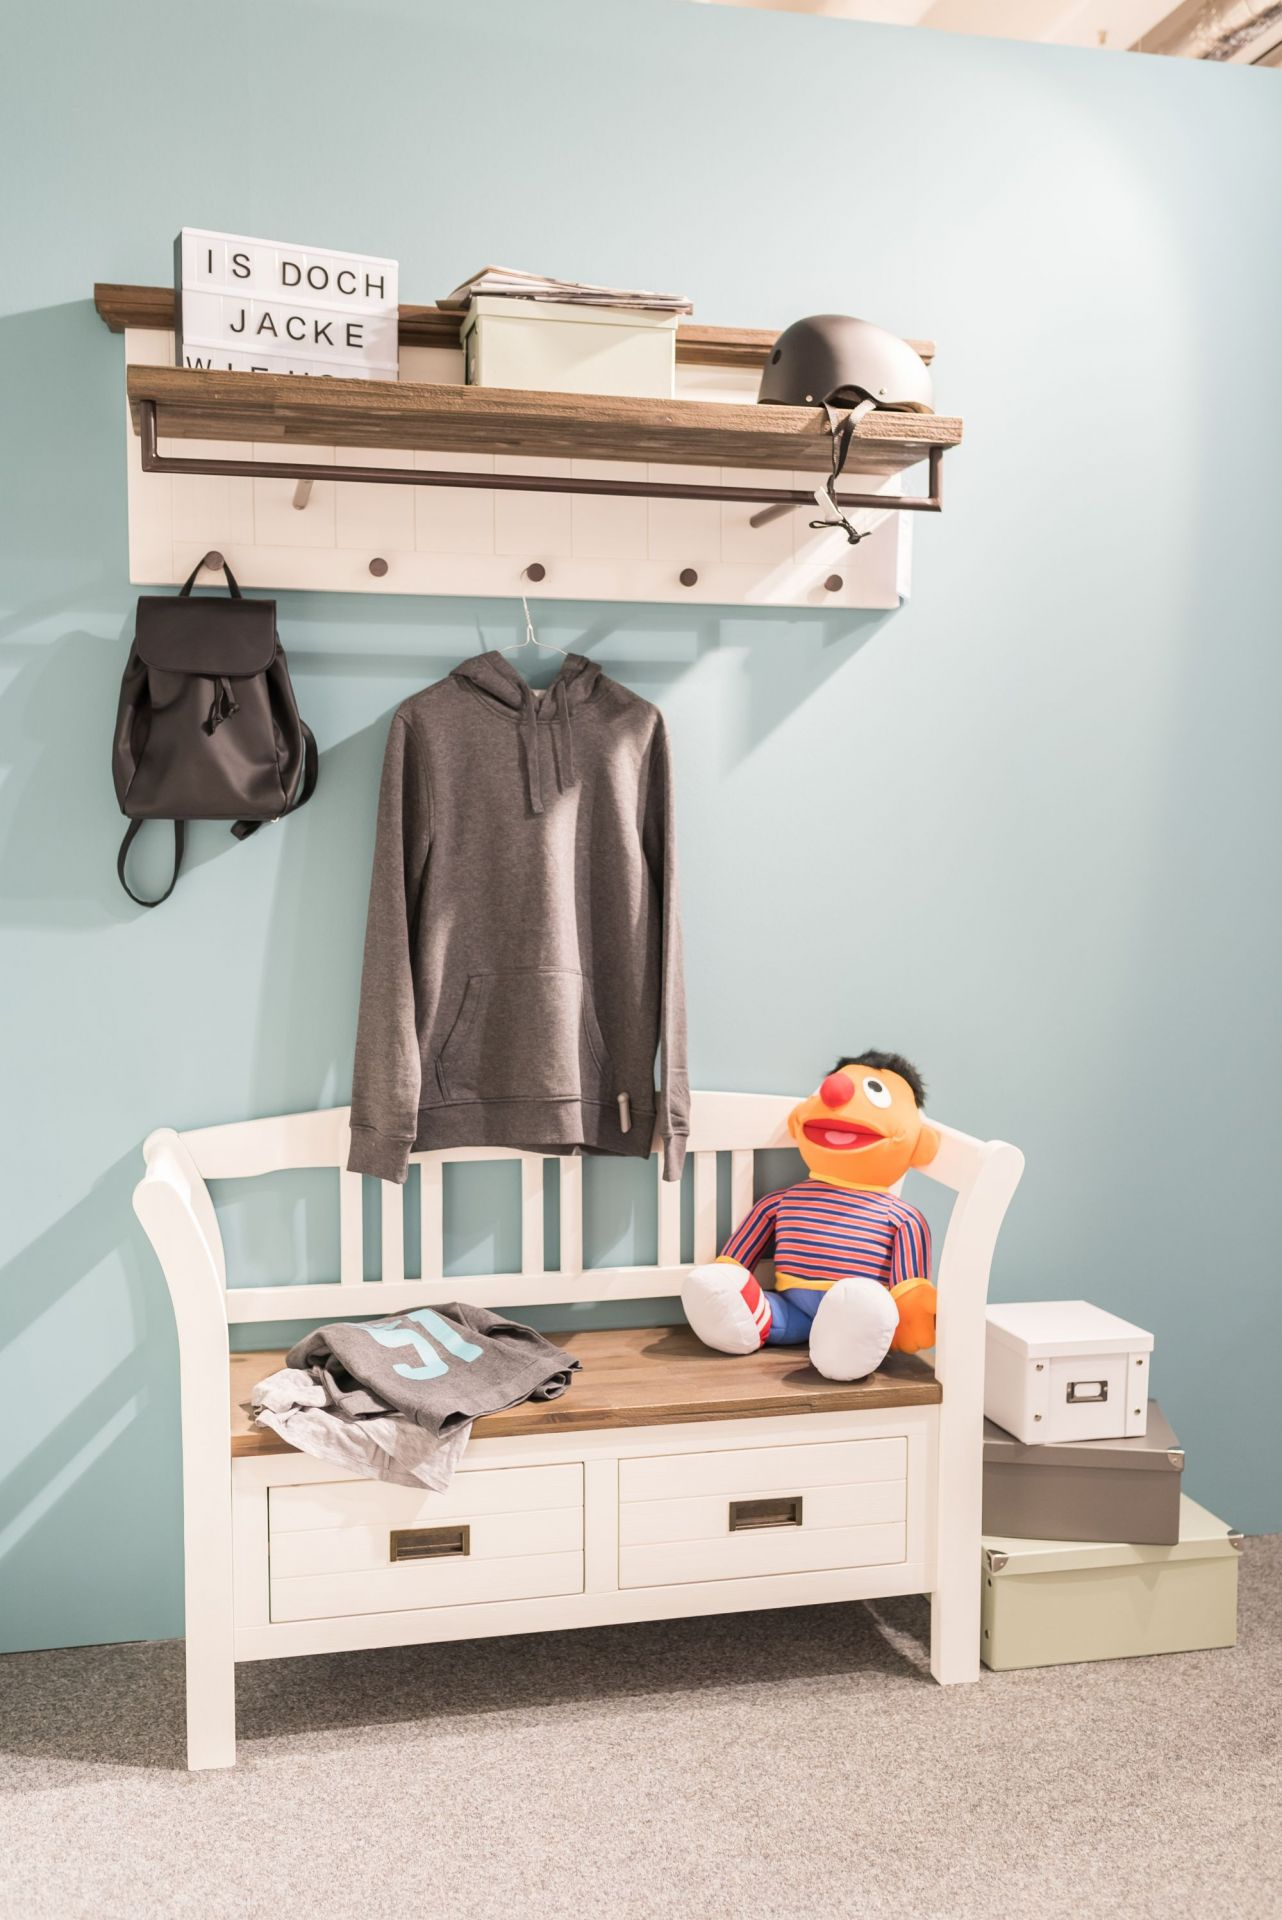 garderoben kaufen in obernburg. Black Bedroom Furniture Sets. Home Design Ideas